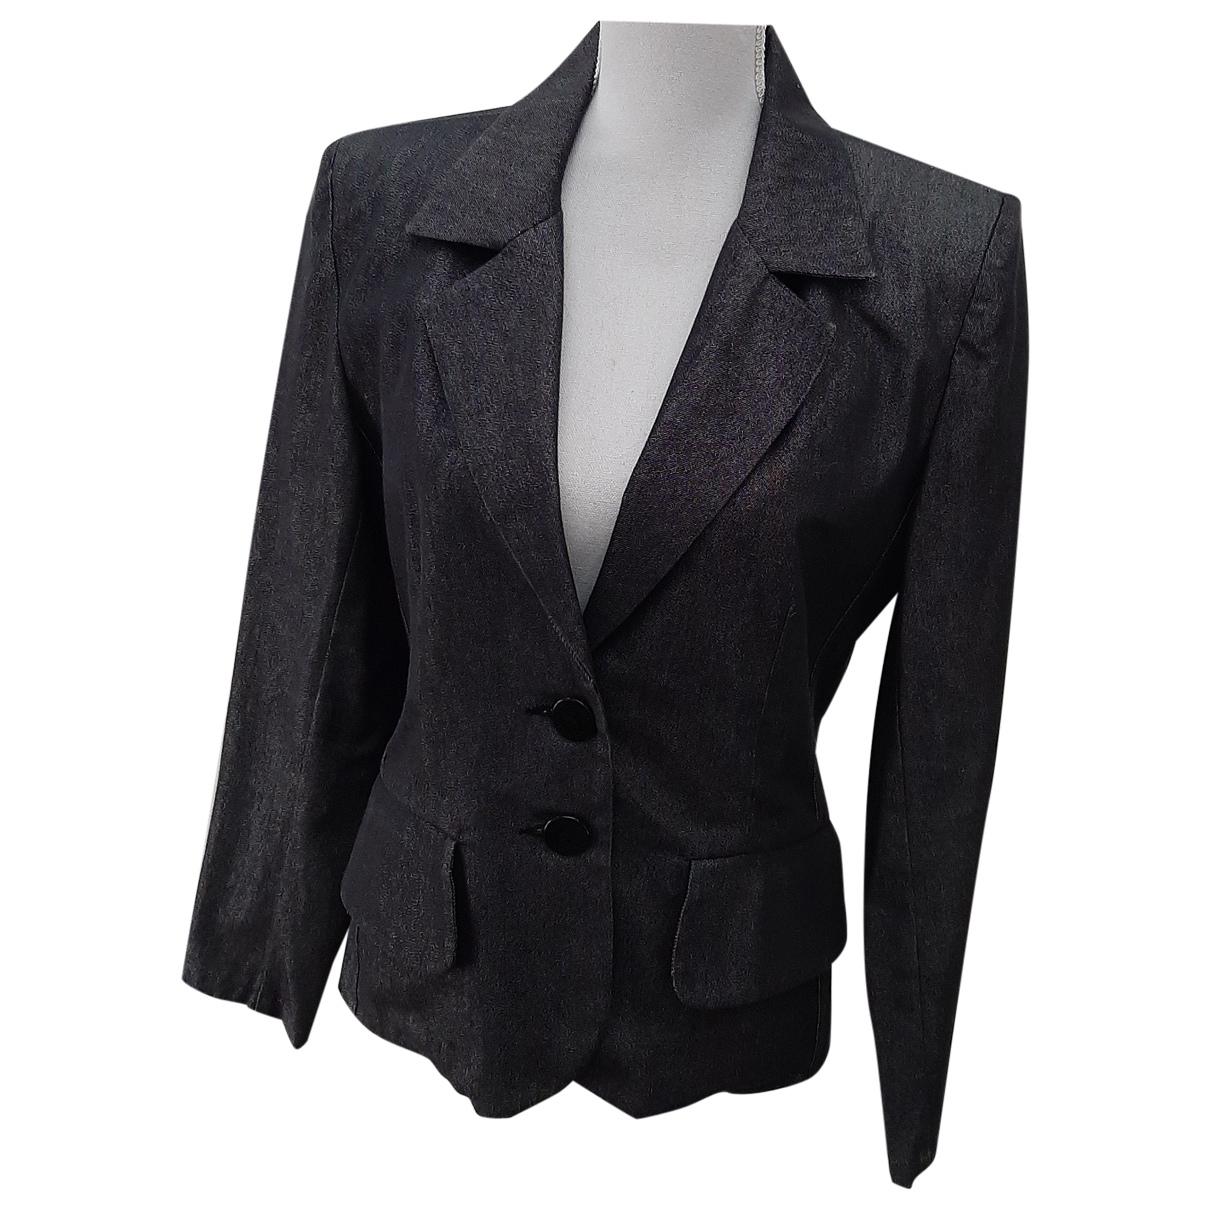 Yves Saint Laurent \N Anthracite Cotton jacket for Women 38 FR